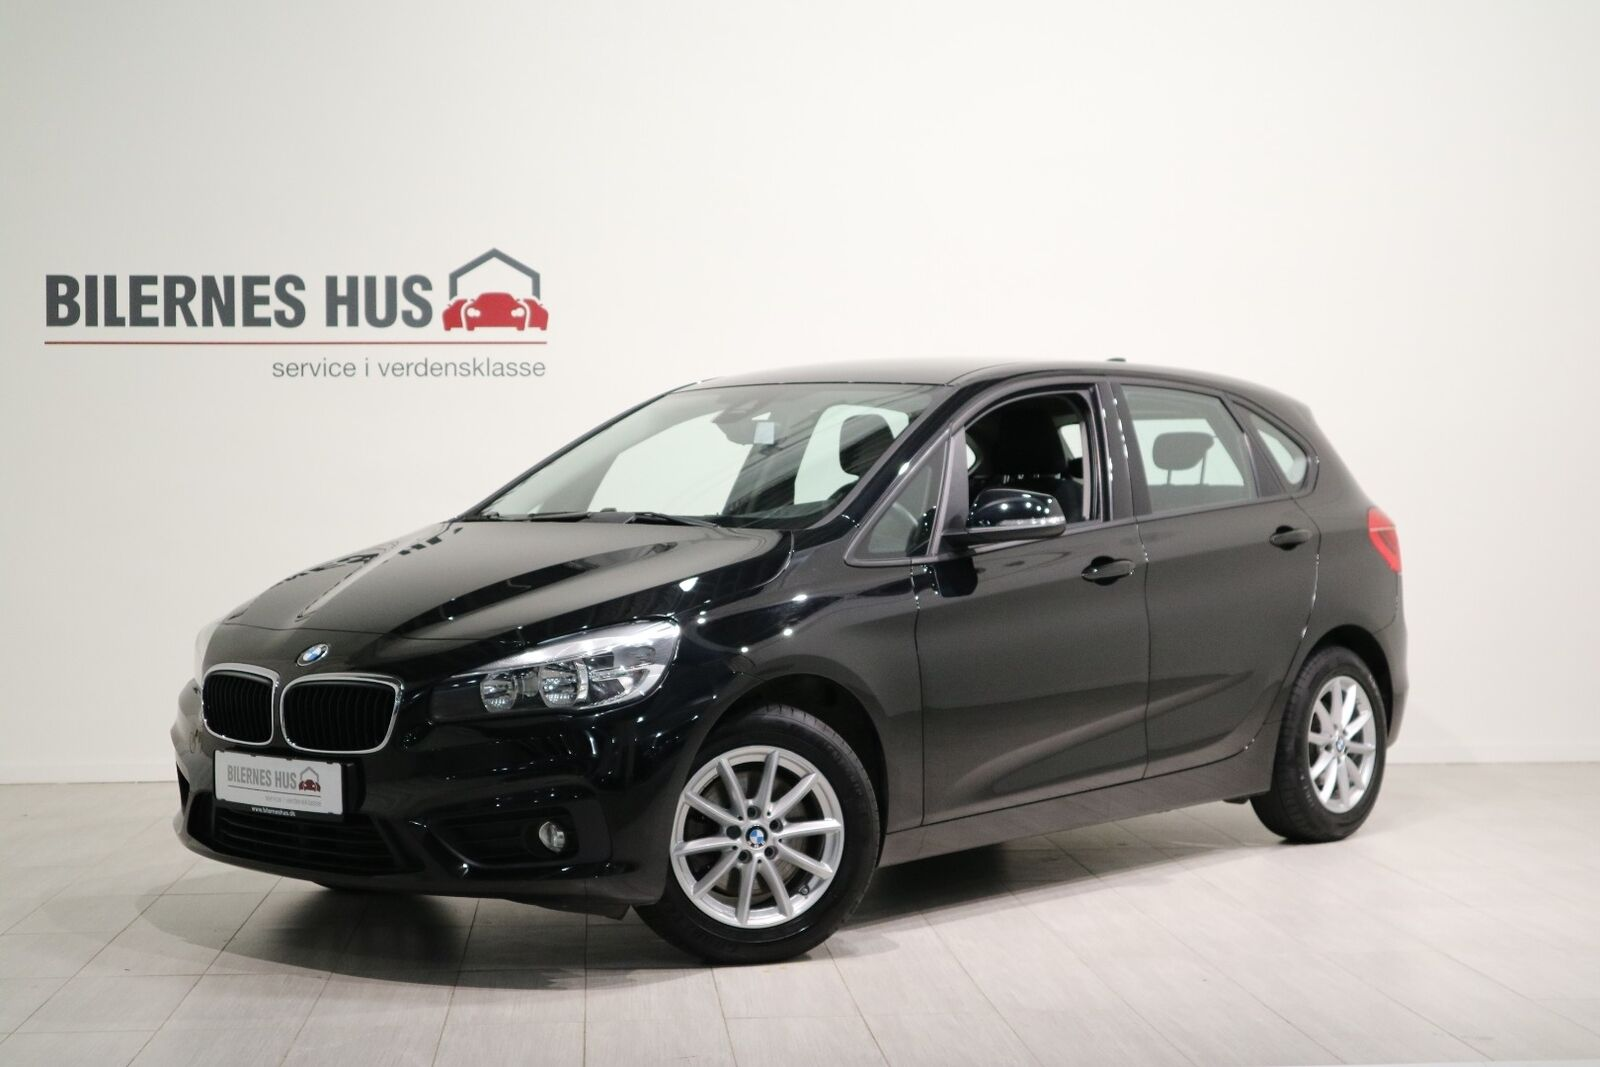 BMW 218i 1,5 Active Tourer